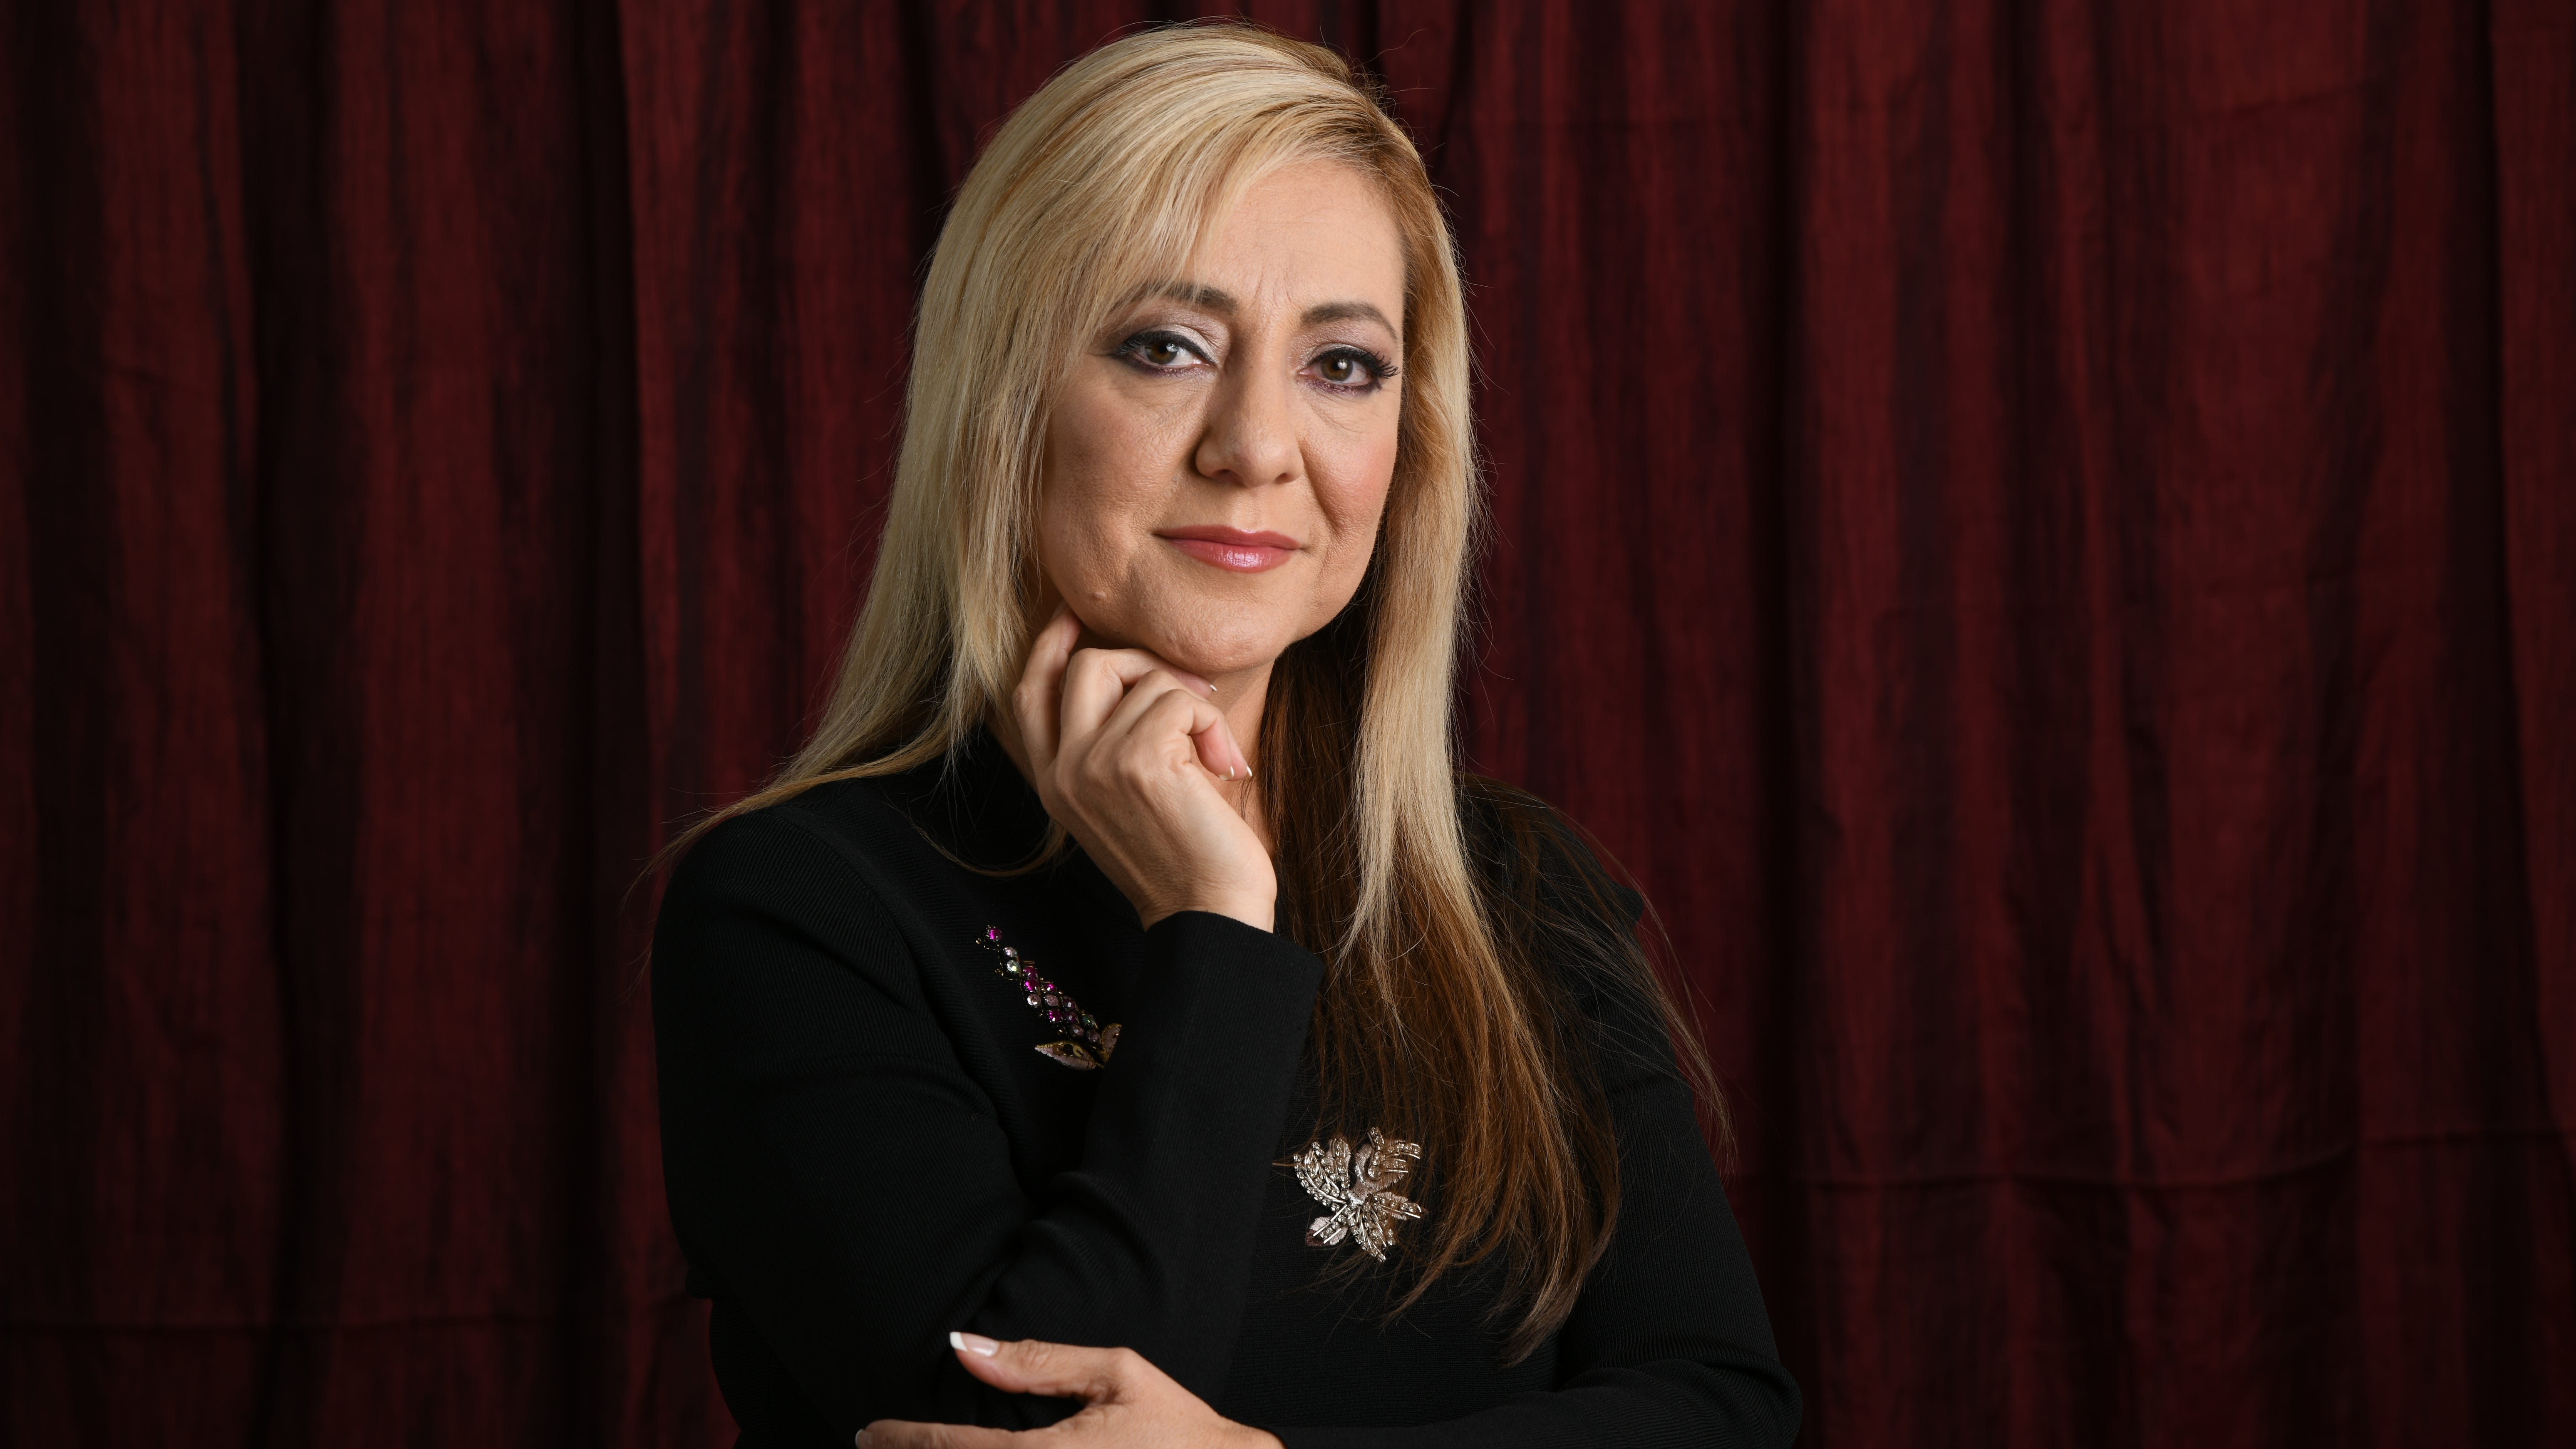 Lorena Bobbitt: Lorena Bobbitt Wanted John In The New Docu-series: 'I Know